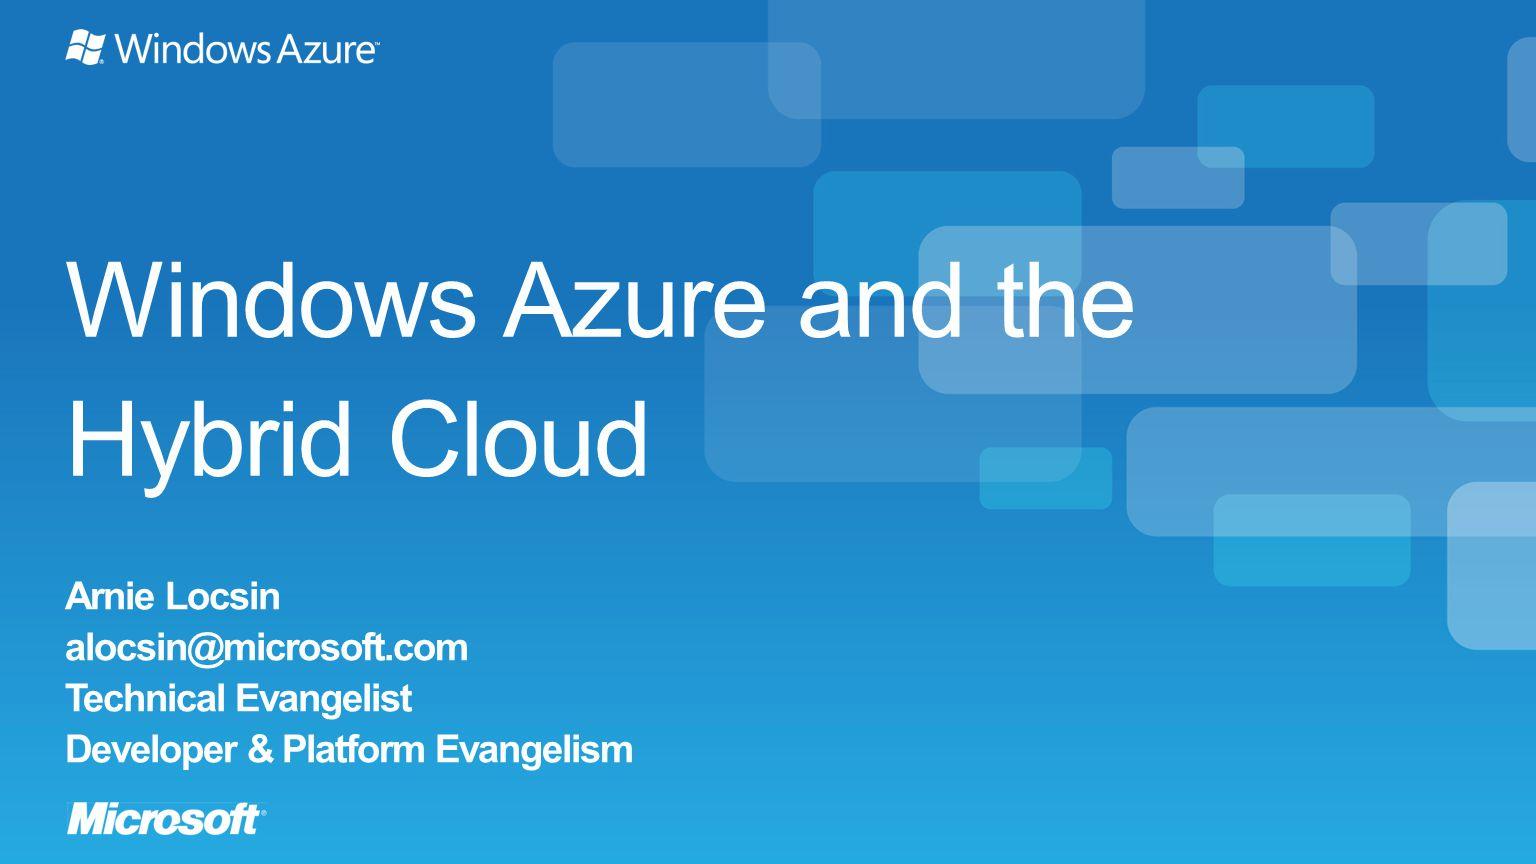 Windows Azure and the Hybrid Cloud Arnie Locsin alocsin@microsoft.com Technical Evangelist Developer & Platform Evangelism